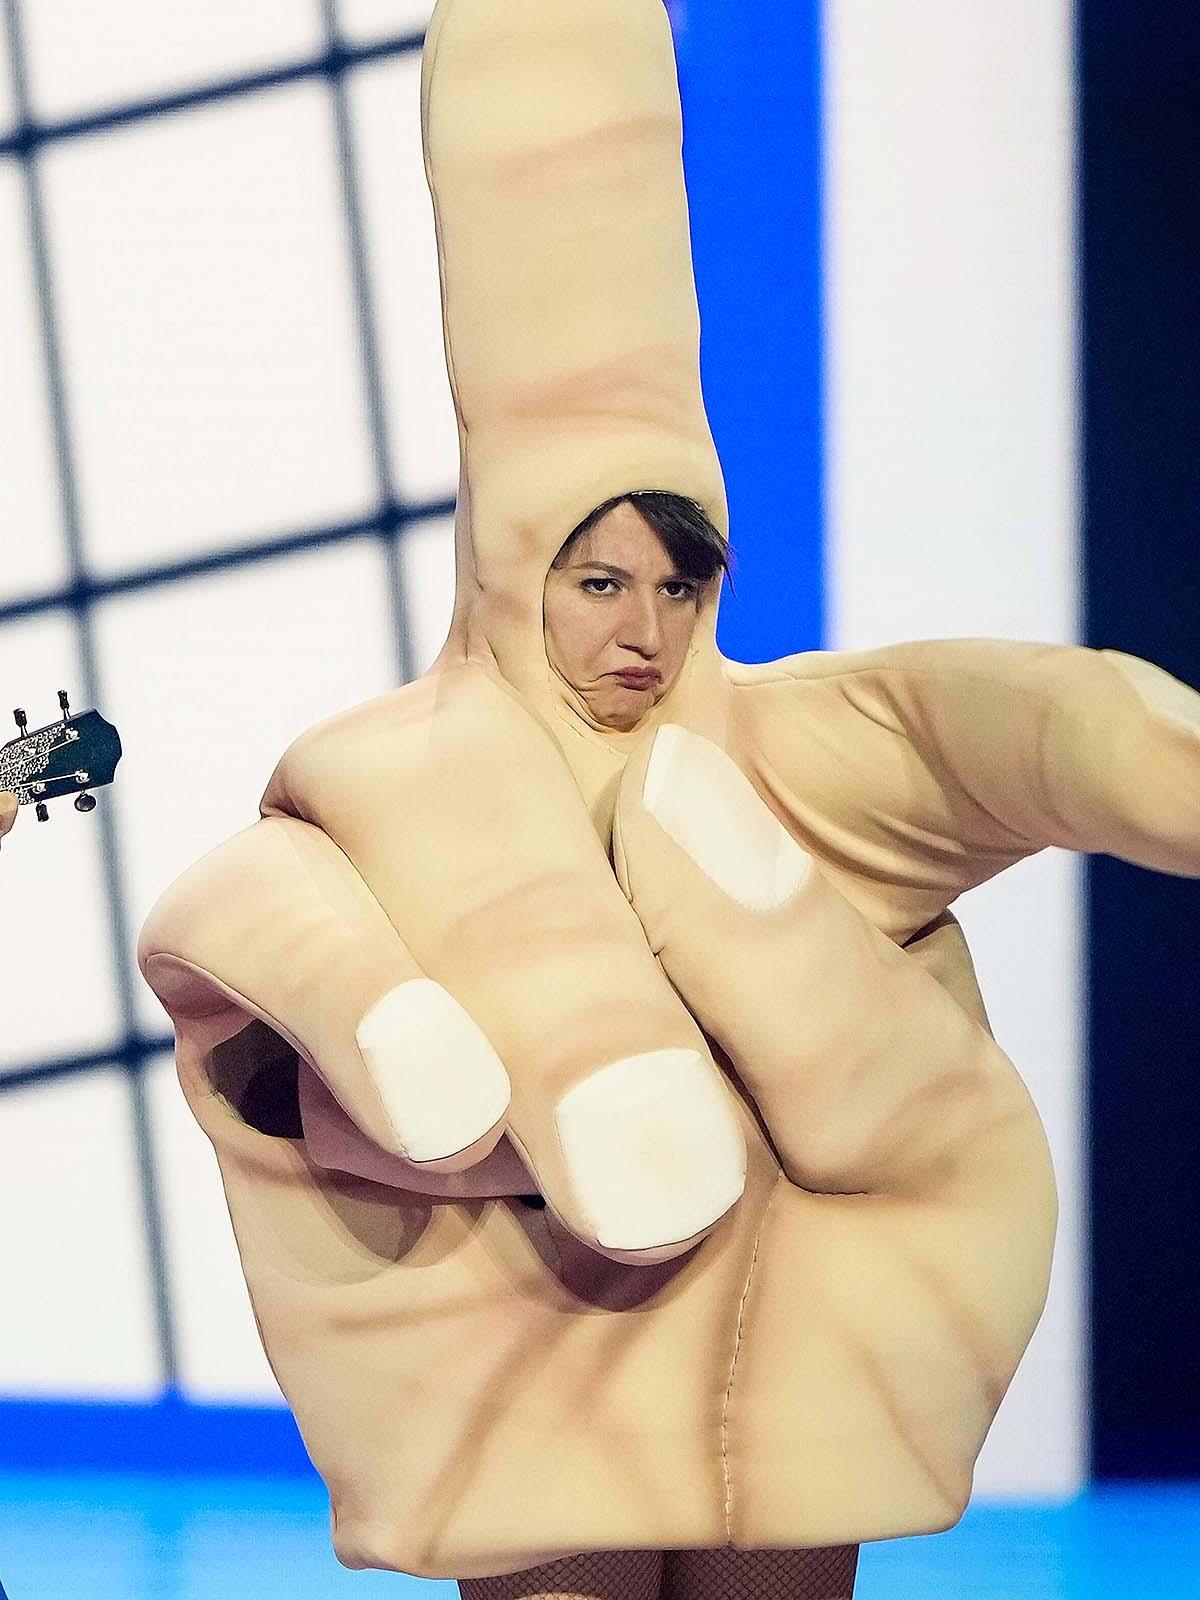 ESC: Pleitesänger Jendrik Sigwart zeigt seinen Kritikern den Mittelfinger